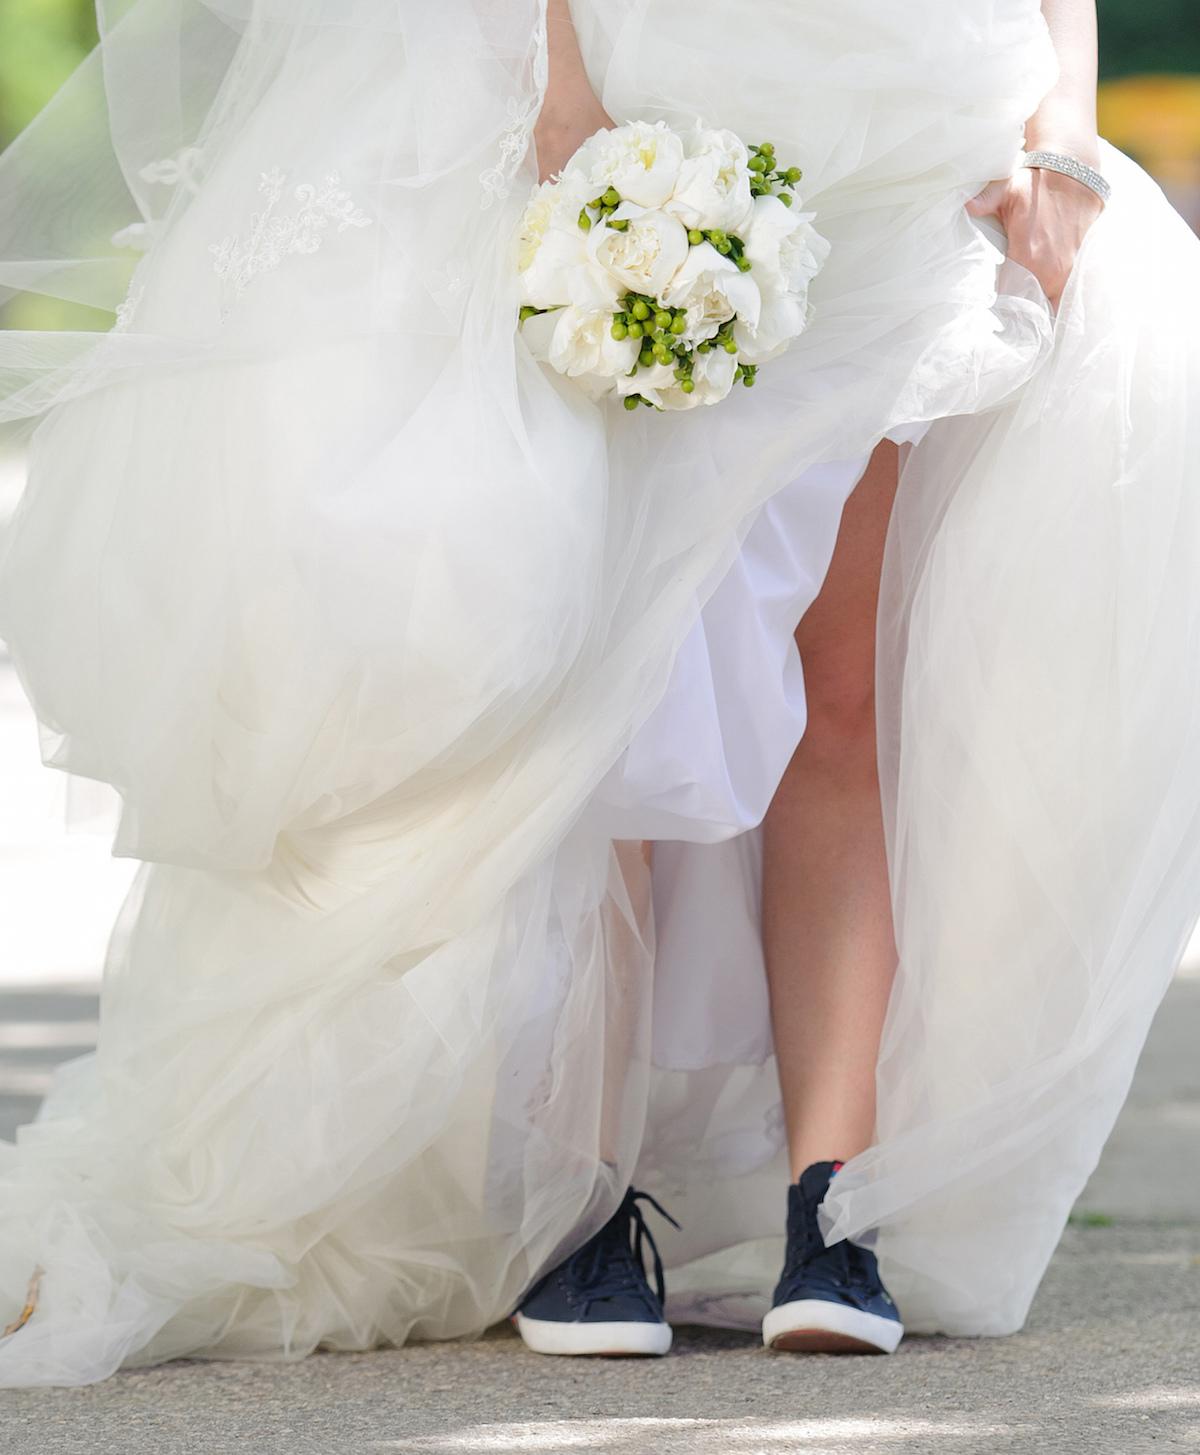 Bride in sneakers in park via Shutterstock